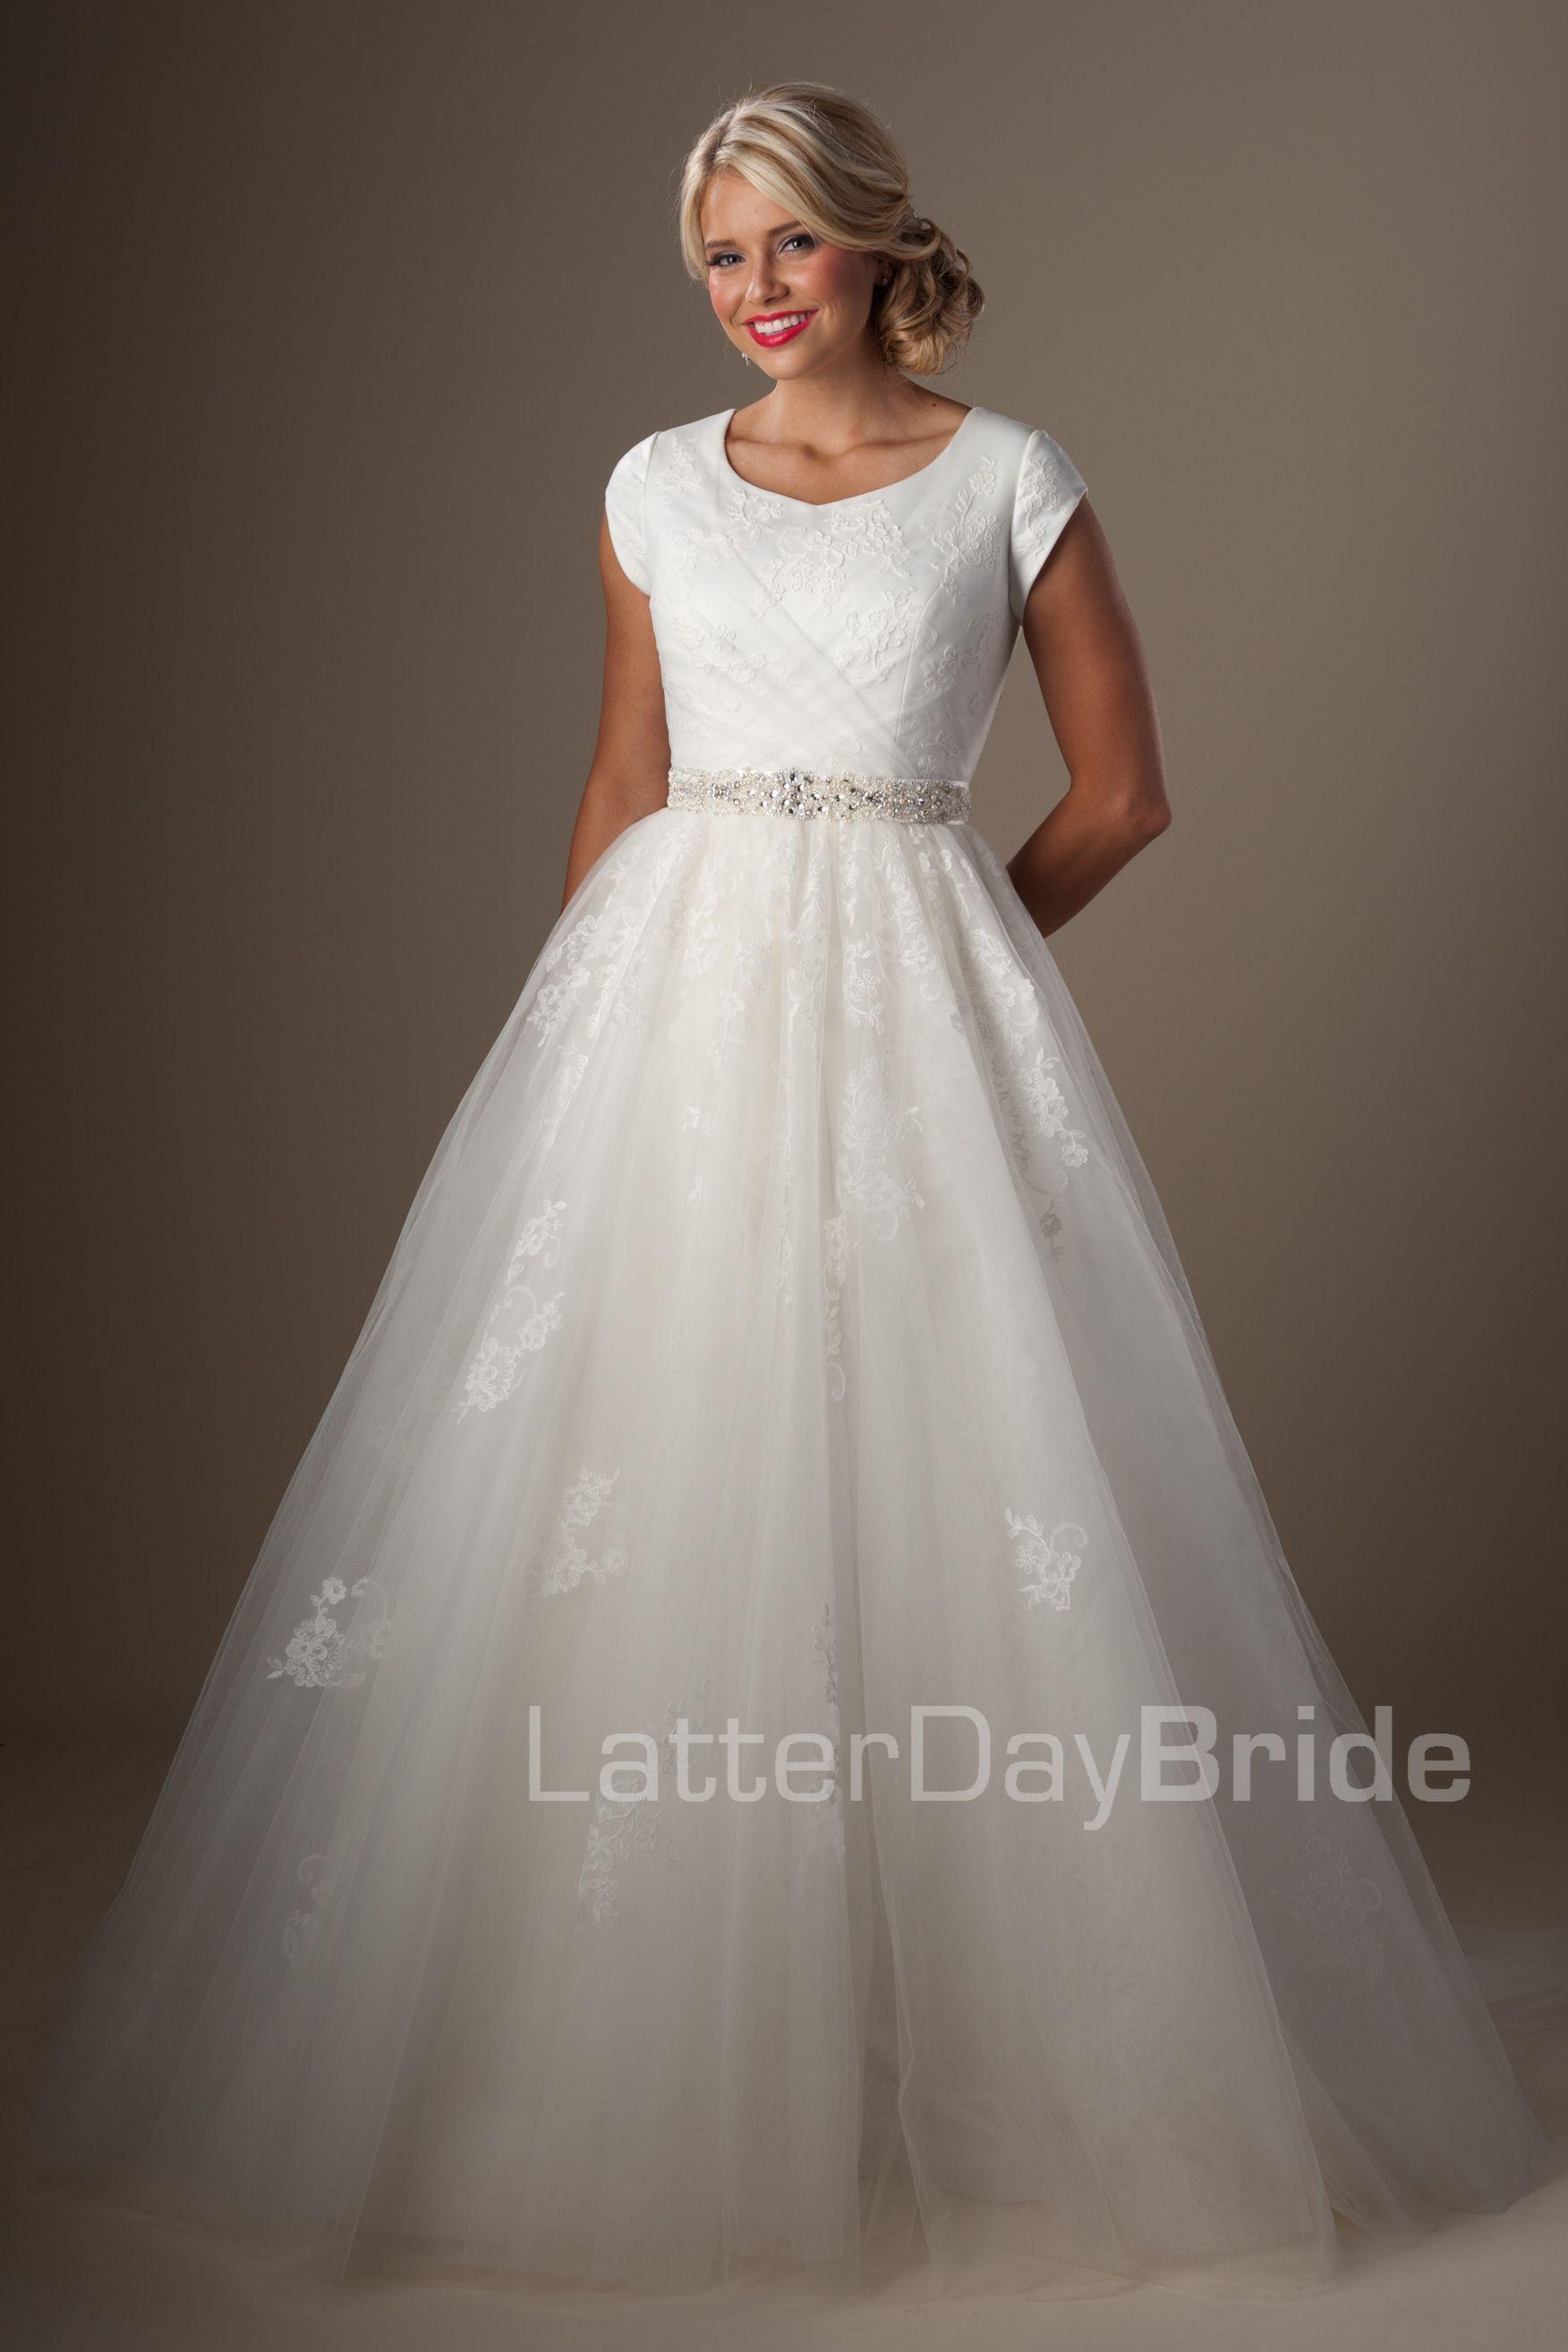 c9fbd4b2046 Modest Wedding Dresses : Tomasina. Latter Day Bride, Gateway Bridal & Prom